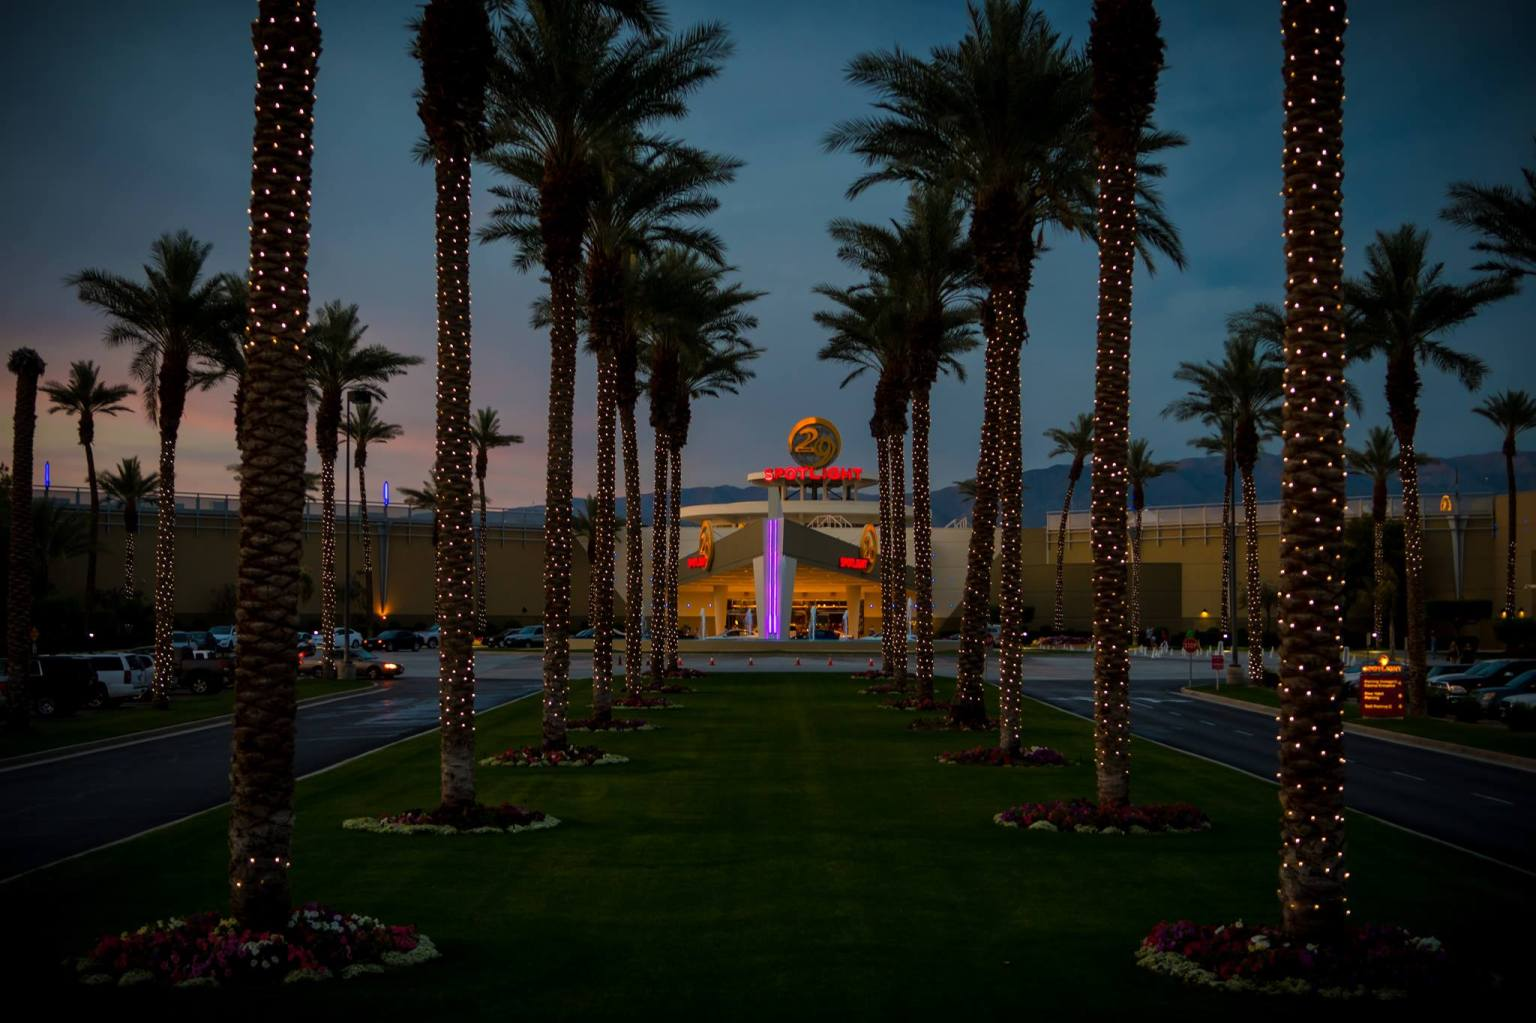 Tuesday Job Fair Set For Spotlight 29 Casino In Coachella